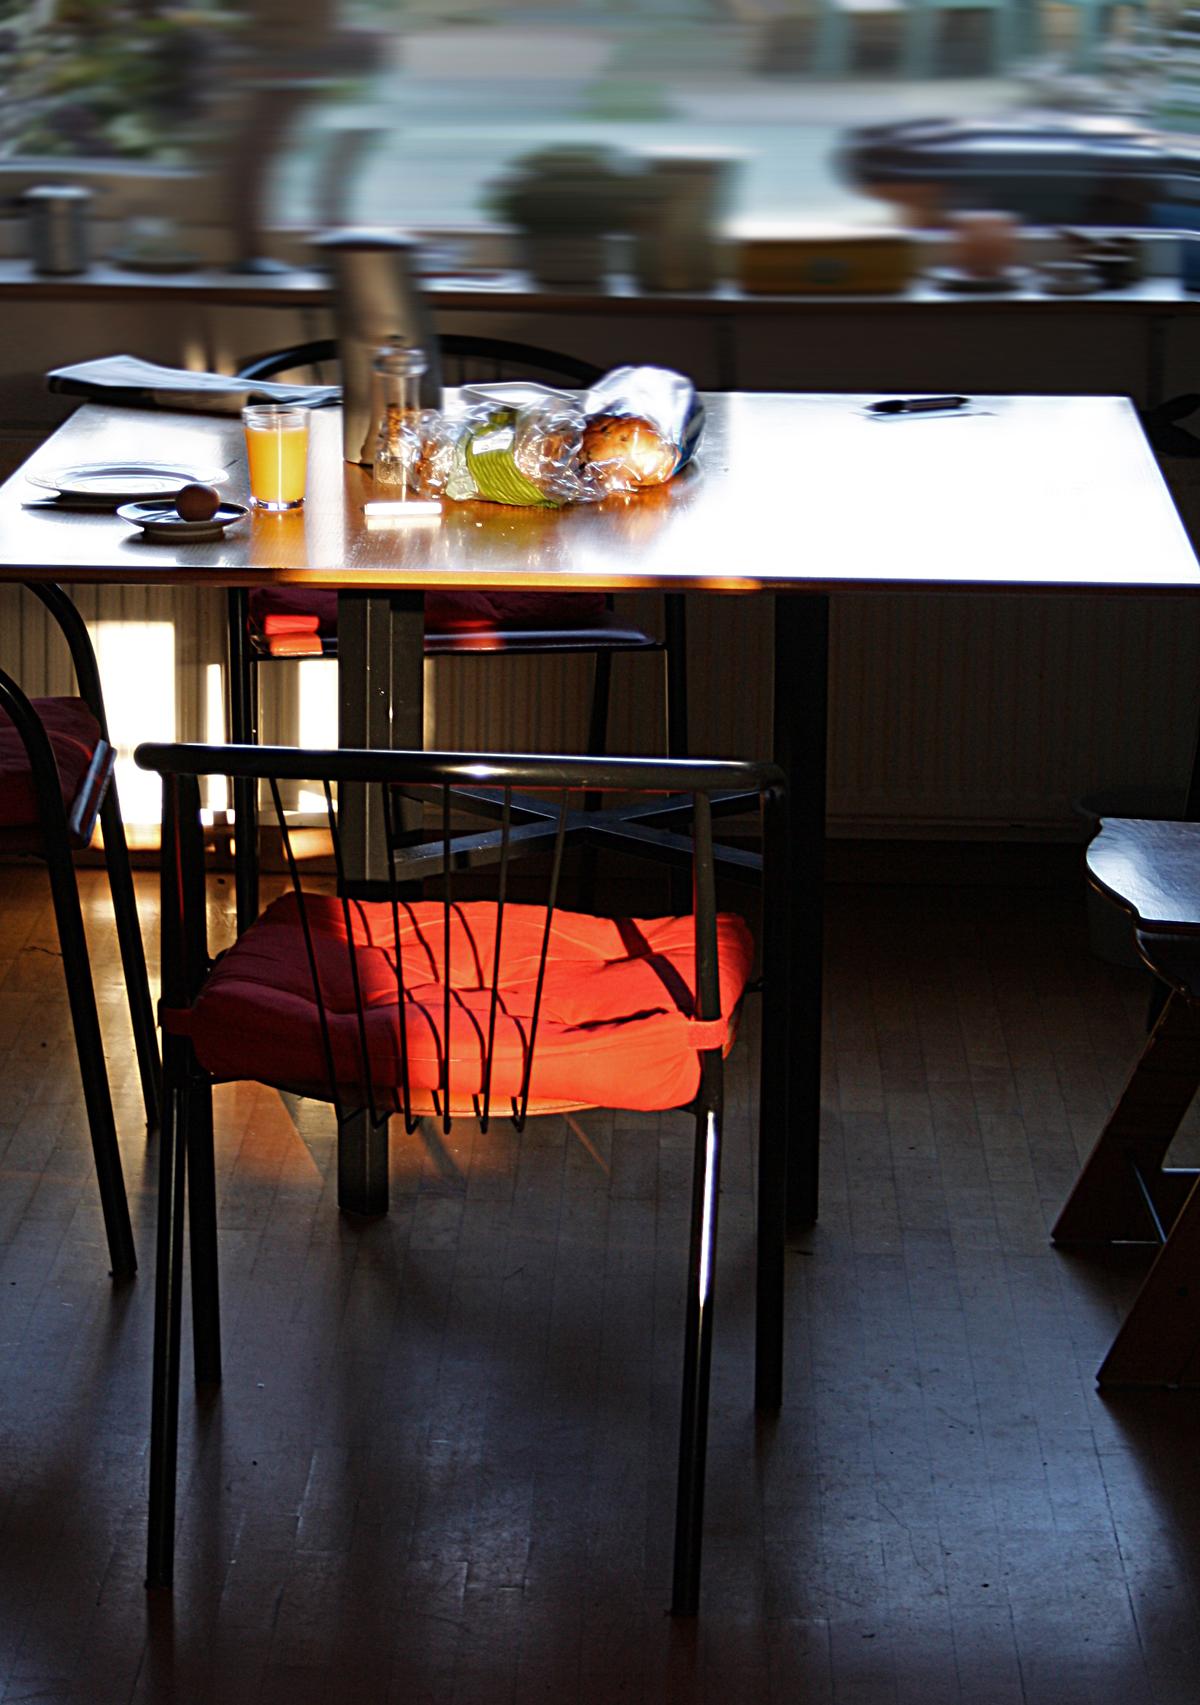 Kotsend boven de ontbijttafel.